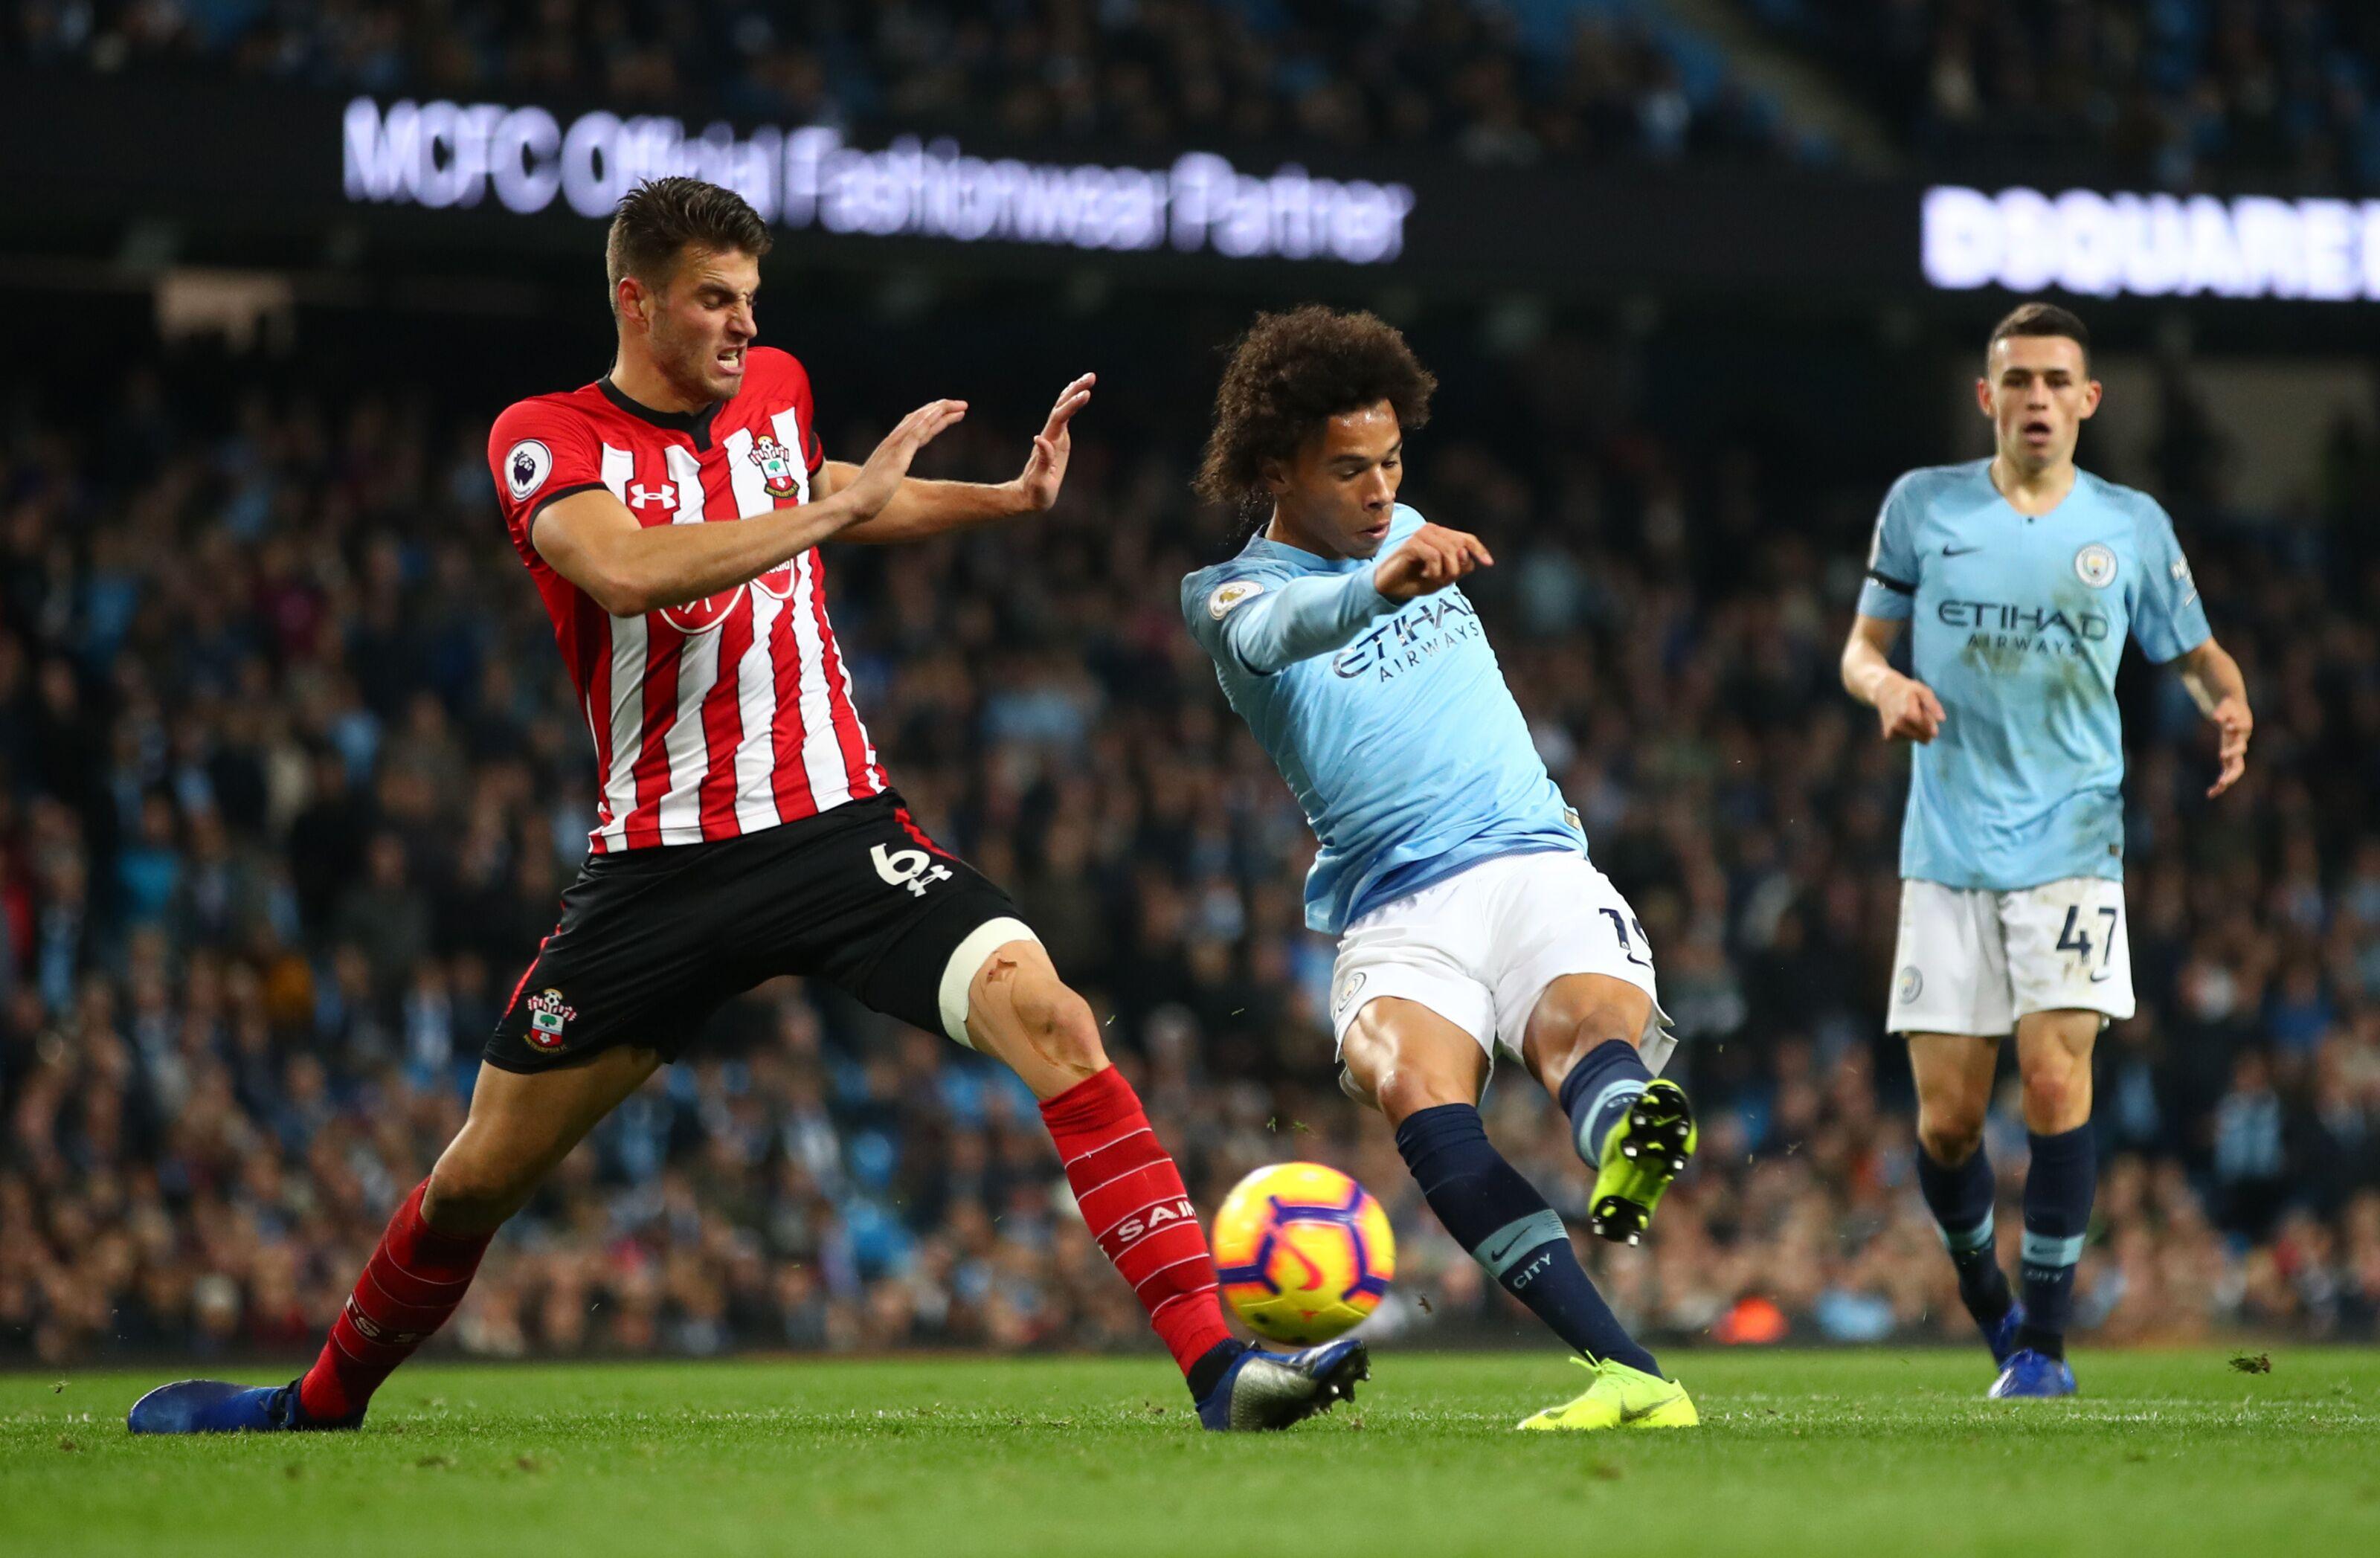 Manchester City 6-1 Southampton: Three key players